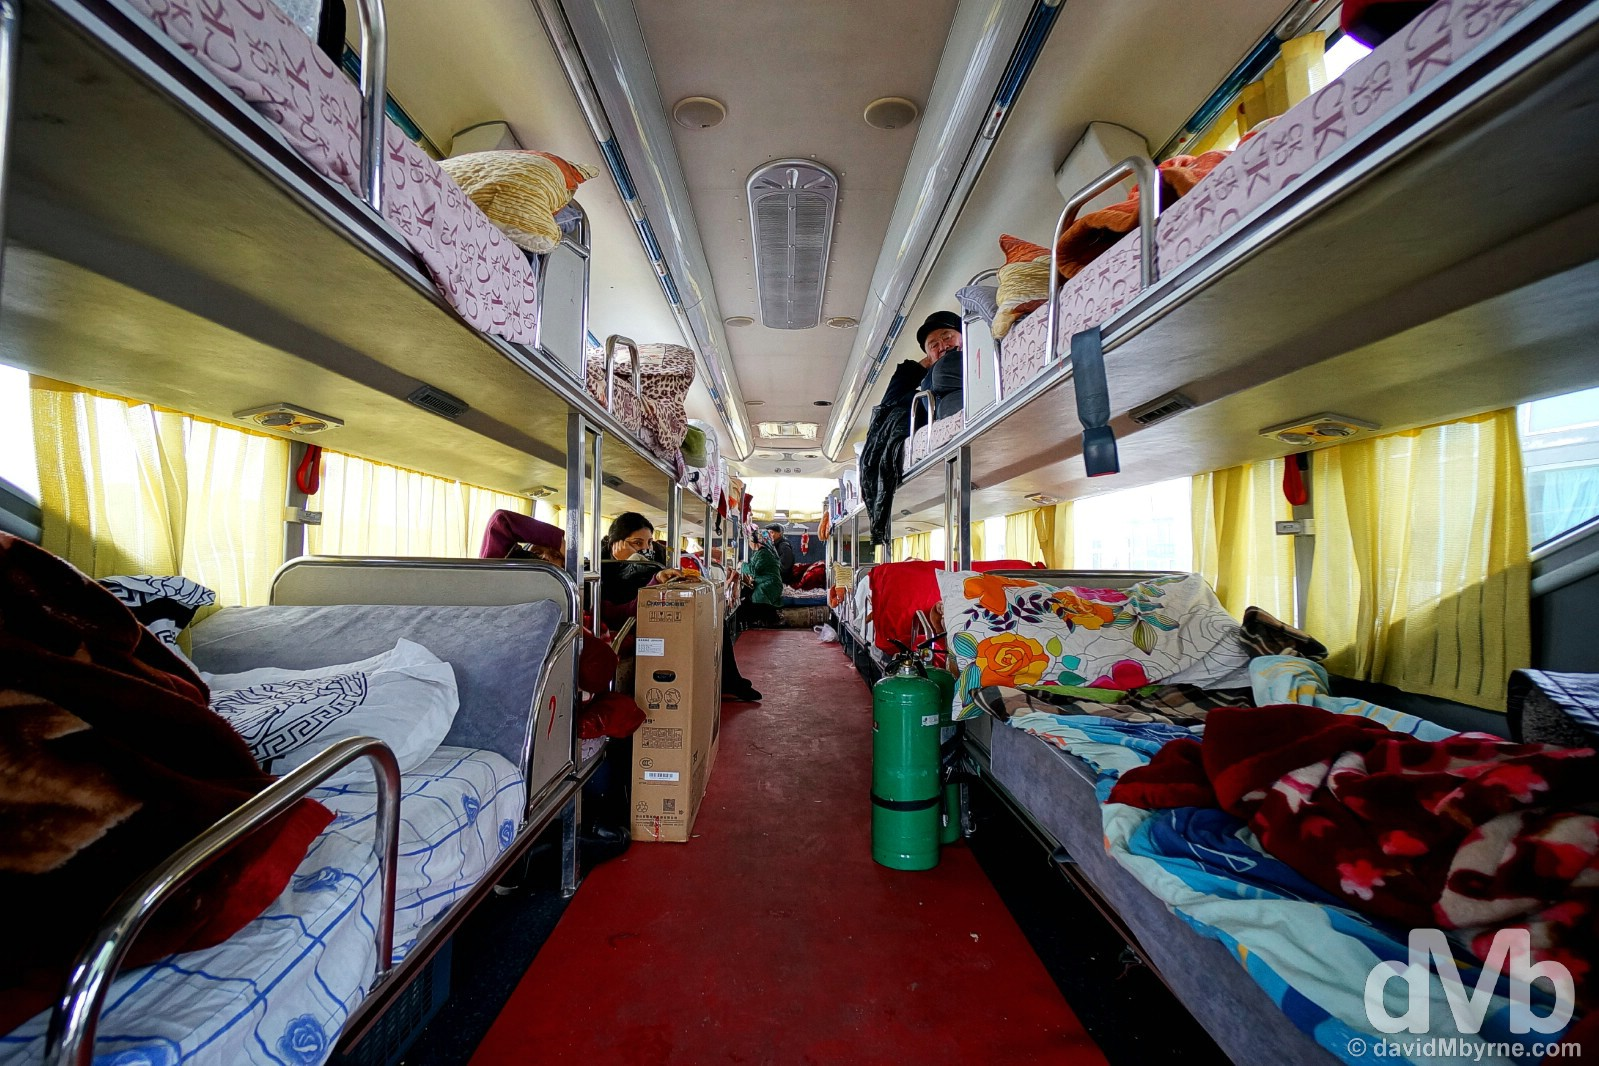 The Urumqi, China, to Almaty, Kazakhstan, sleeper bus on the Kazakh side of the Khorgos border crossing between China & Kazakhstan. February 12, 2015.